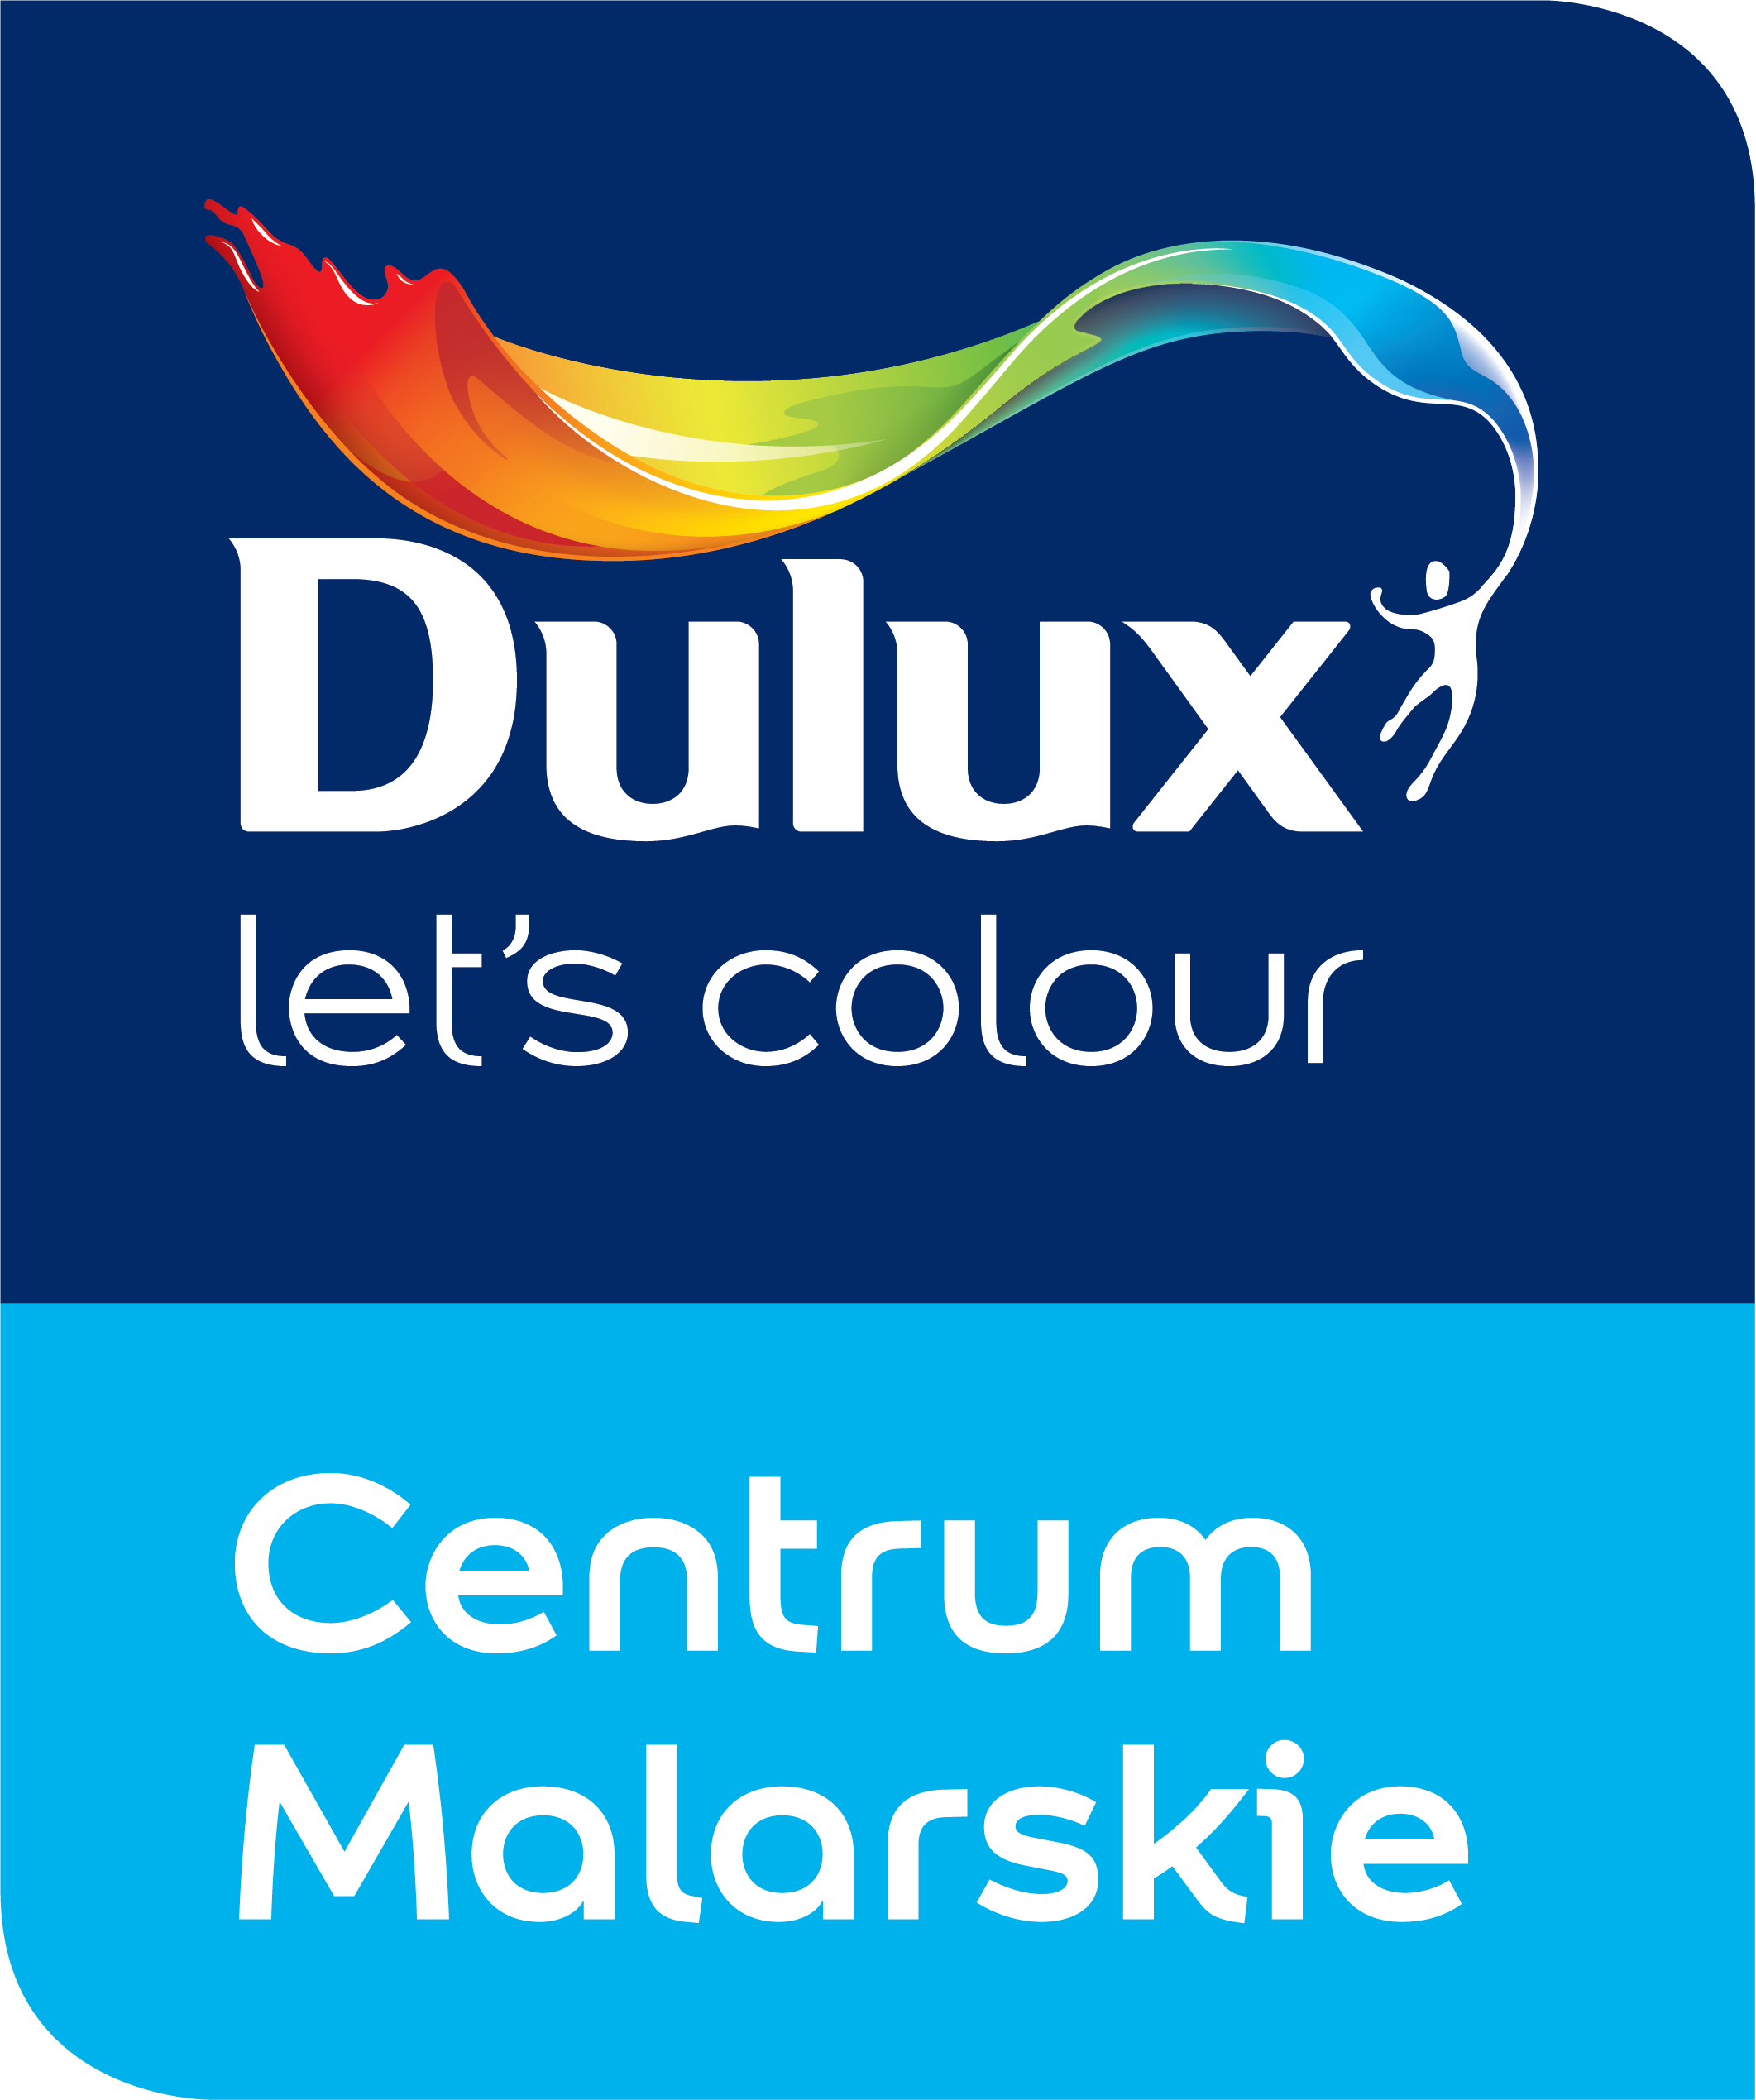 Dulux Centrum Malarskie